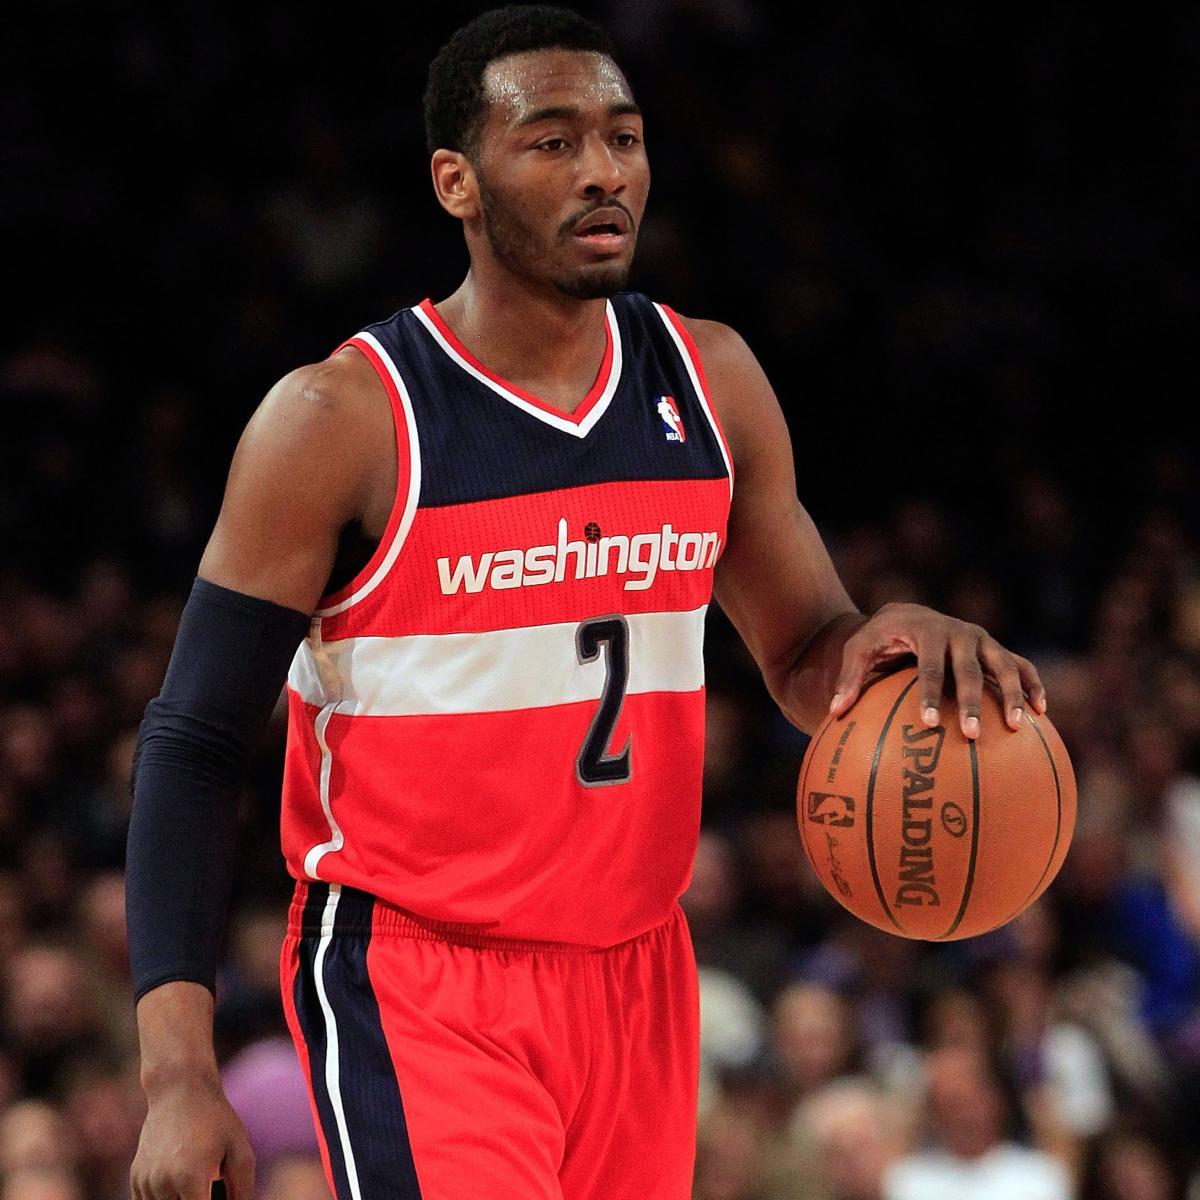 NBA News: Latest Injury Updates On John Wall, Andrew Bynum